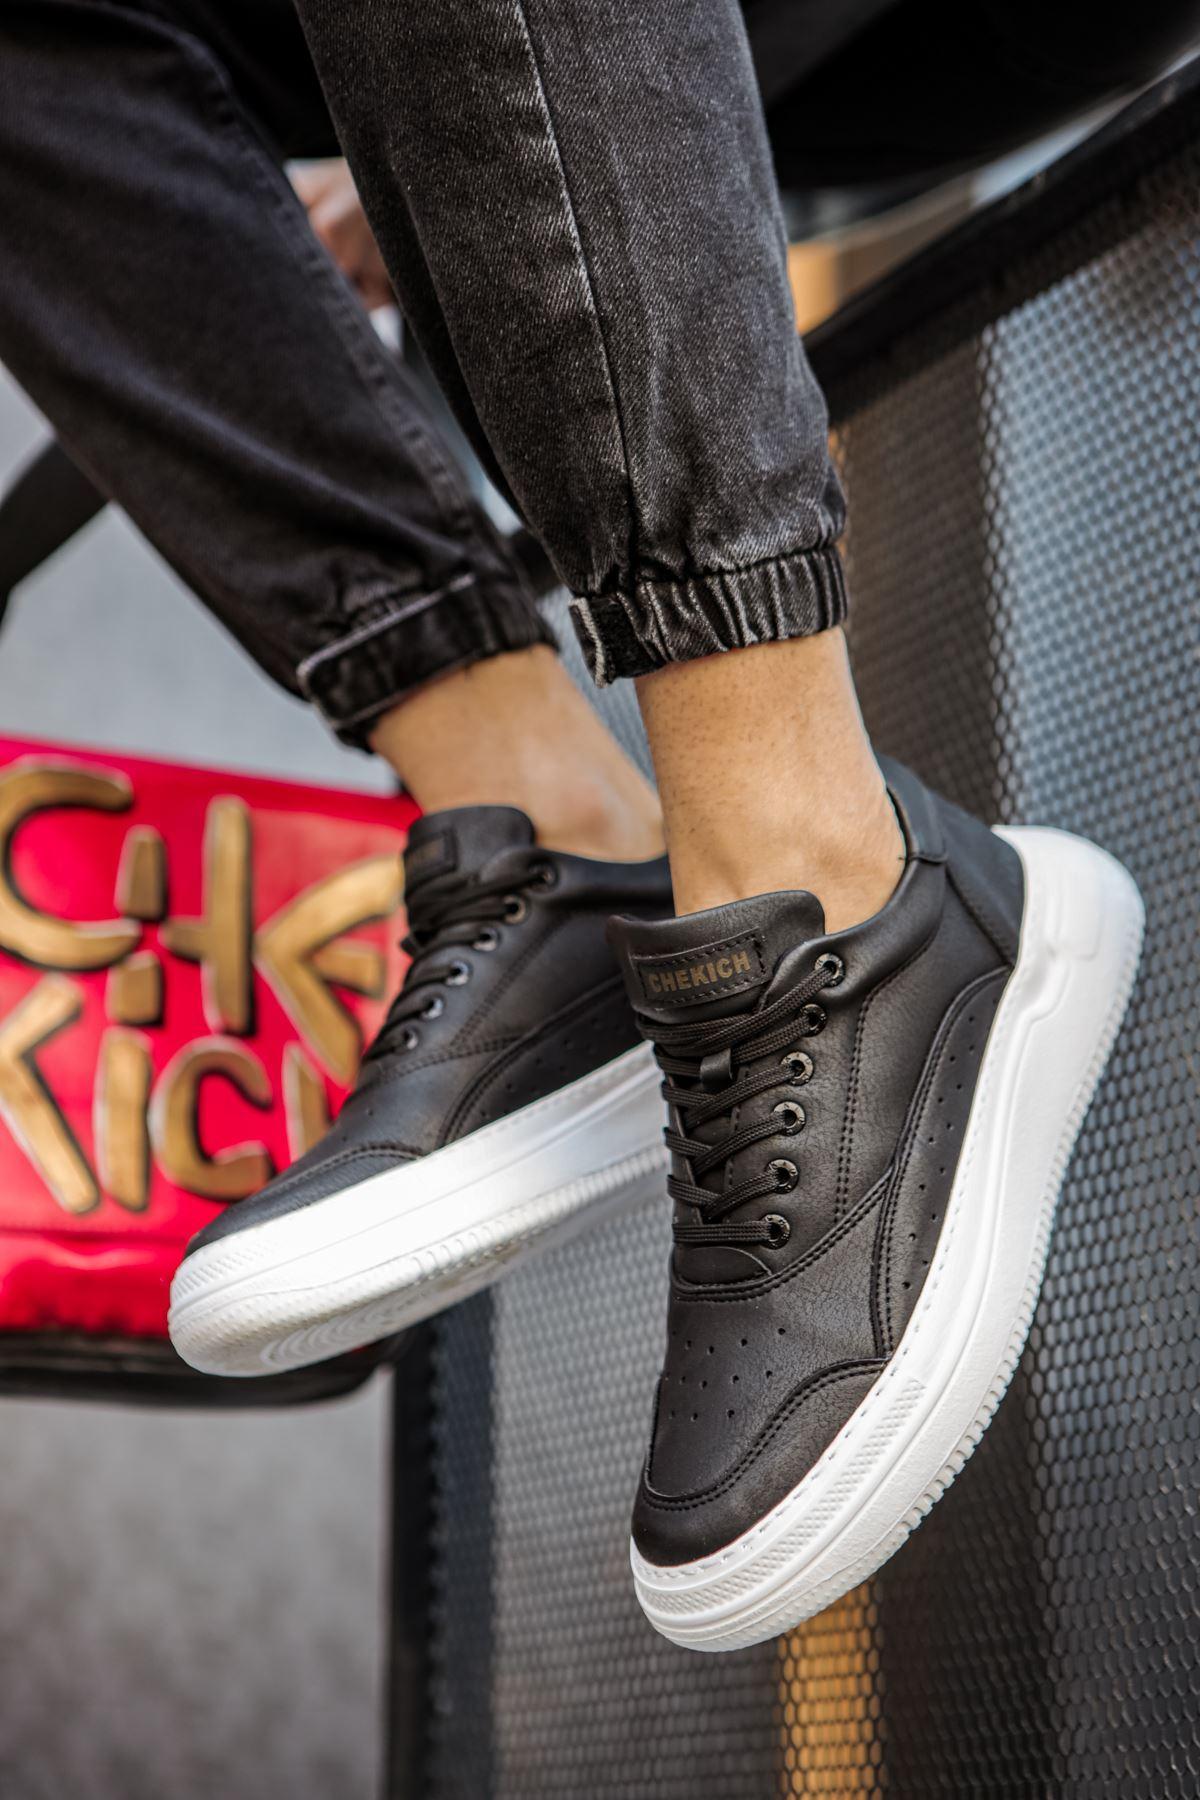 Chekich CH115 İpk. BT Erkek Ayakkabı SIYAH